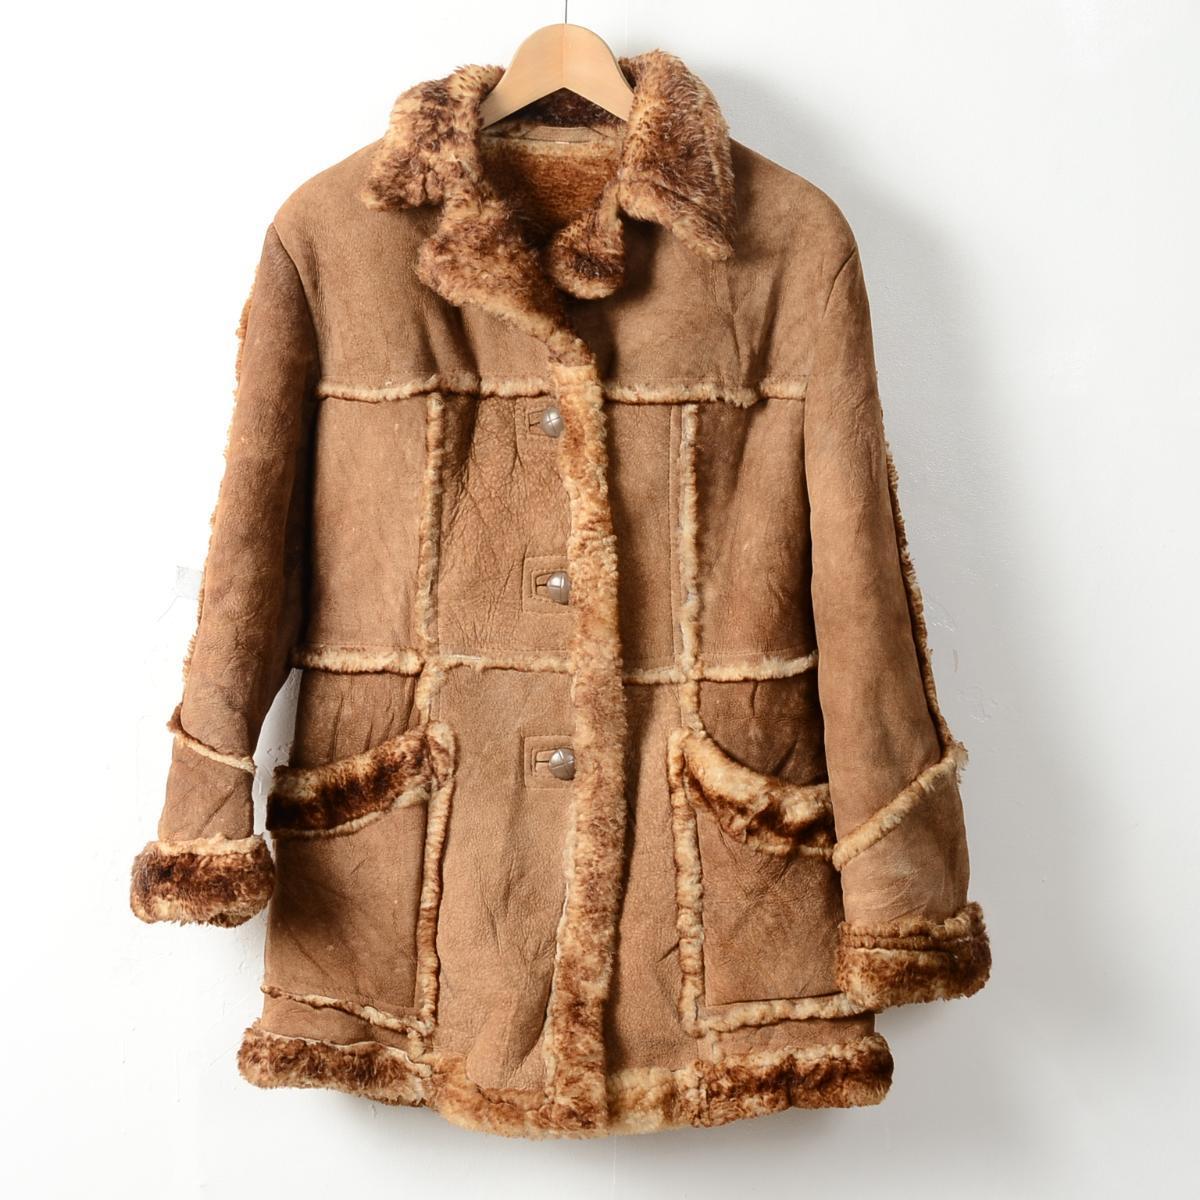 VINTAGE CLOTHING JAM TRADING | Rakuten Global Market: Used clothes